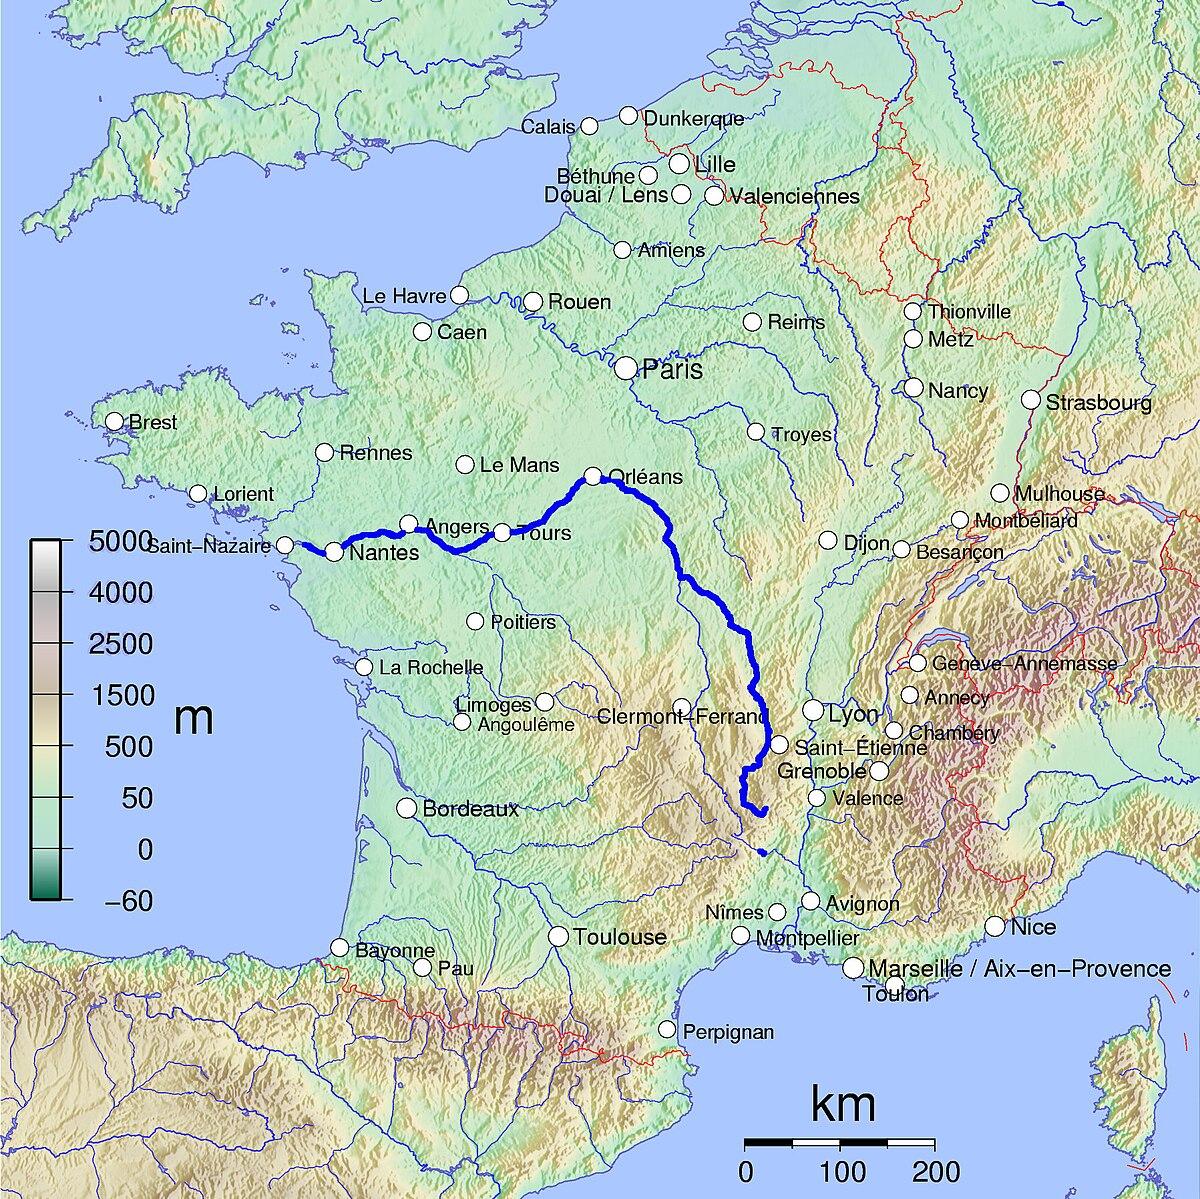 frankrike karta floder Loire – Wikipedia frankrike karta floder